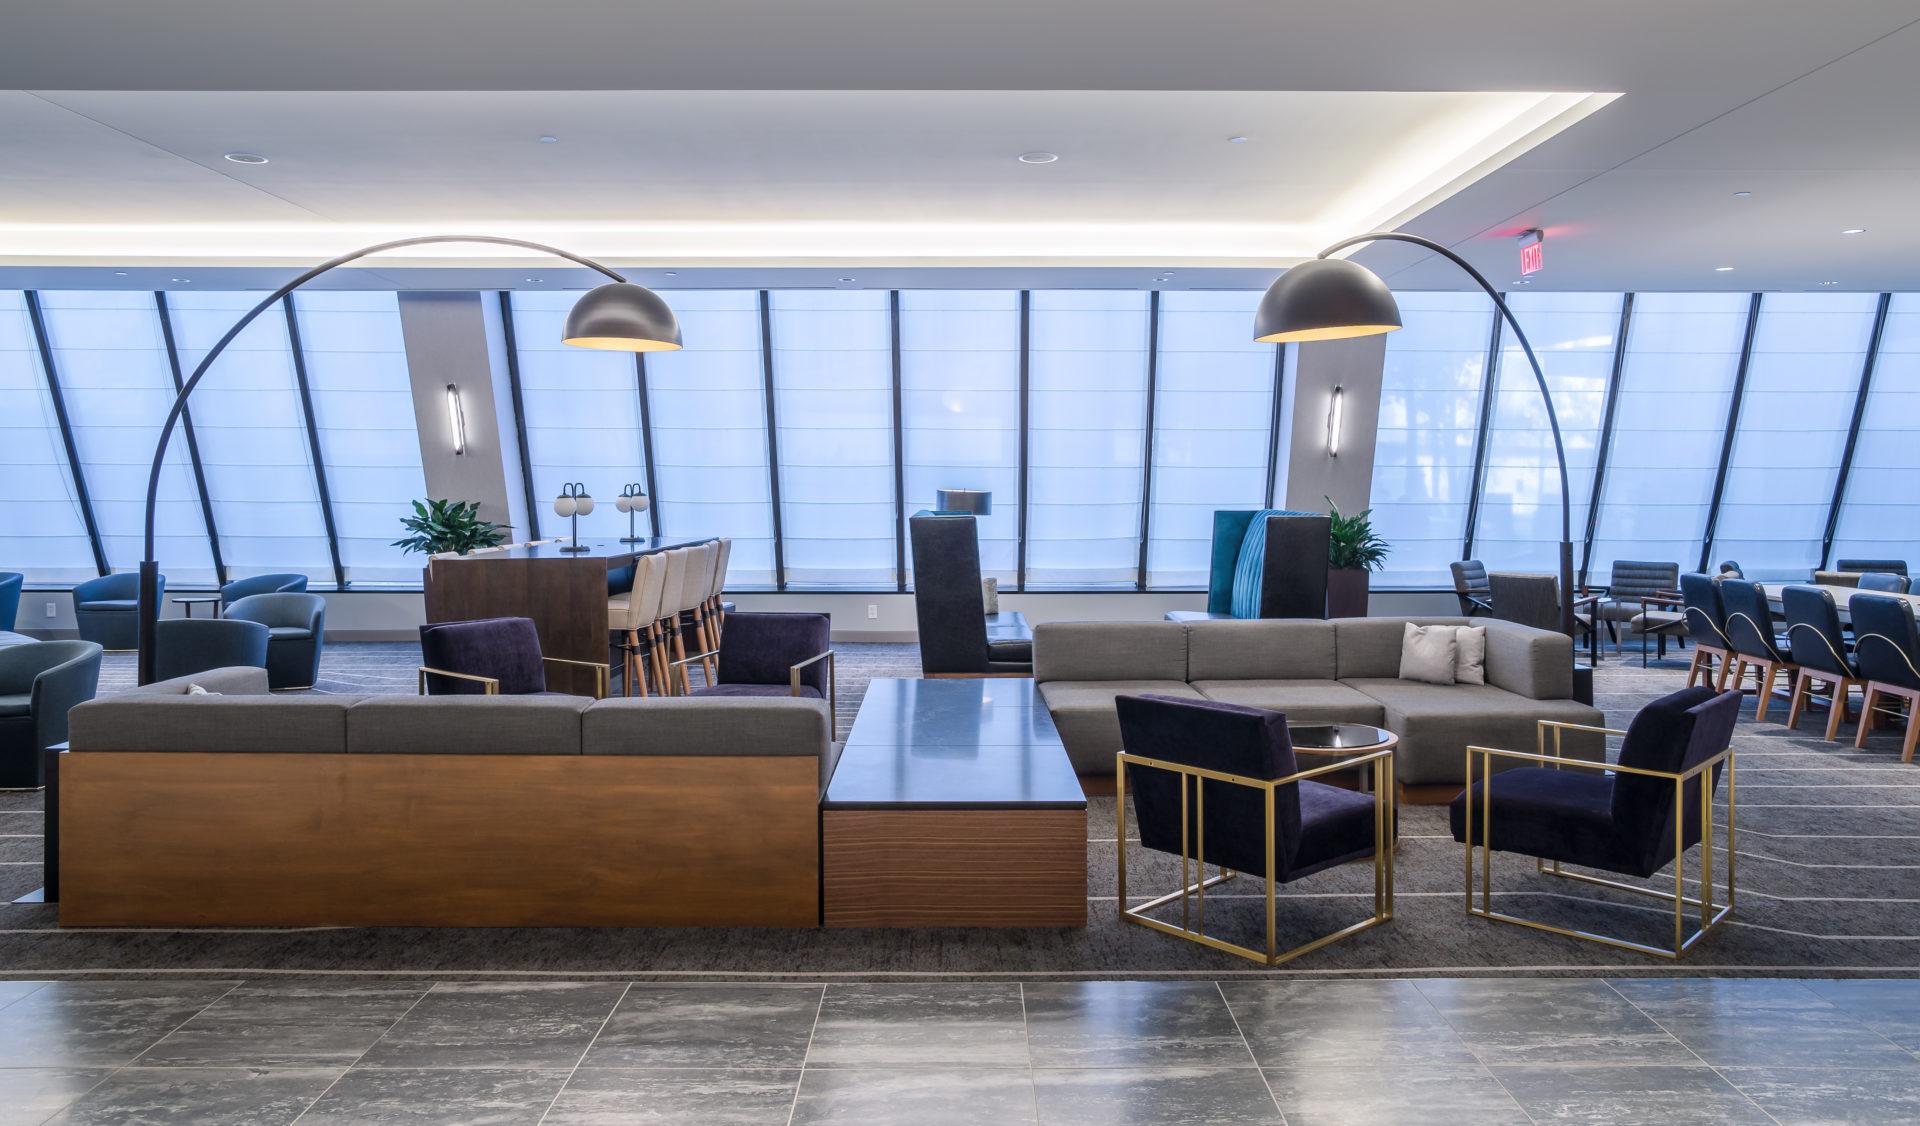 Beautifully designed lounge area at hotel